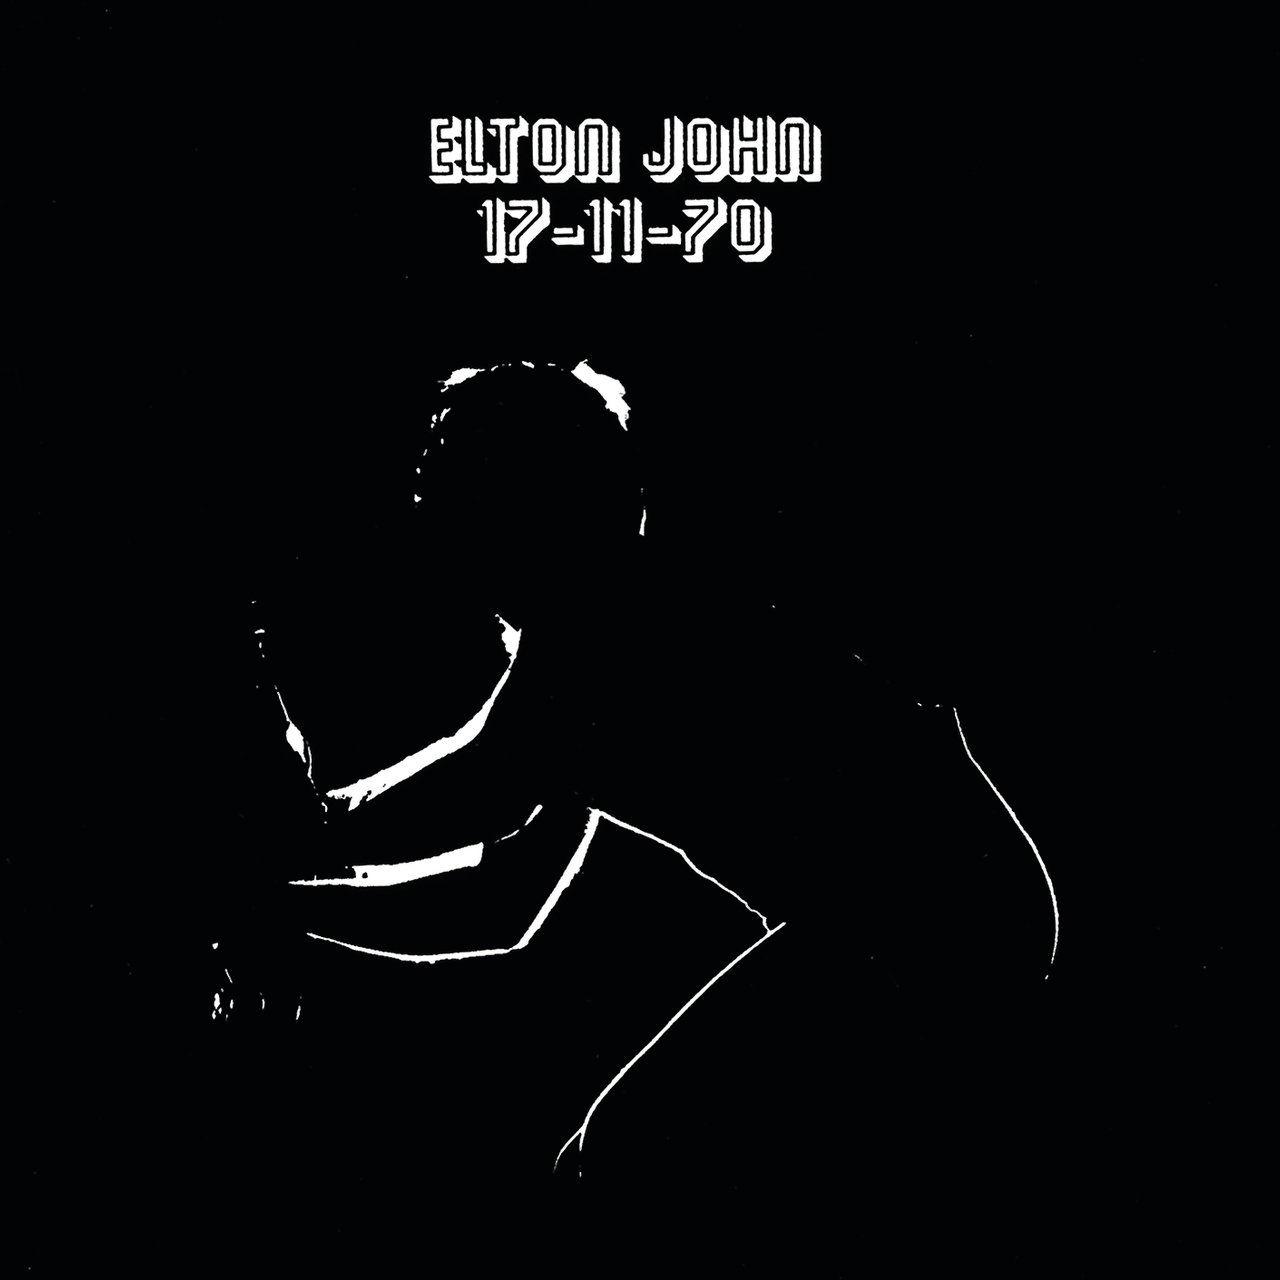 Elton John: 17-11-70